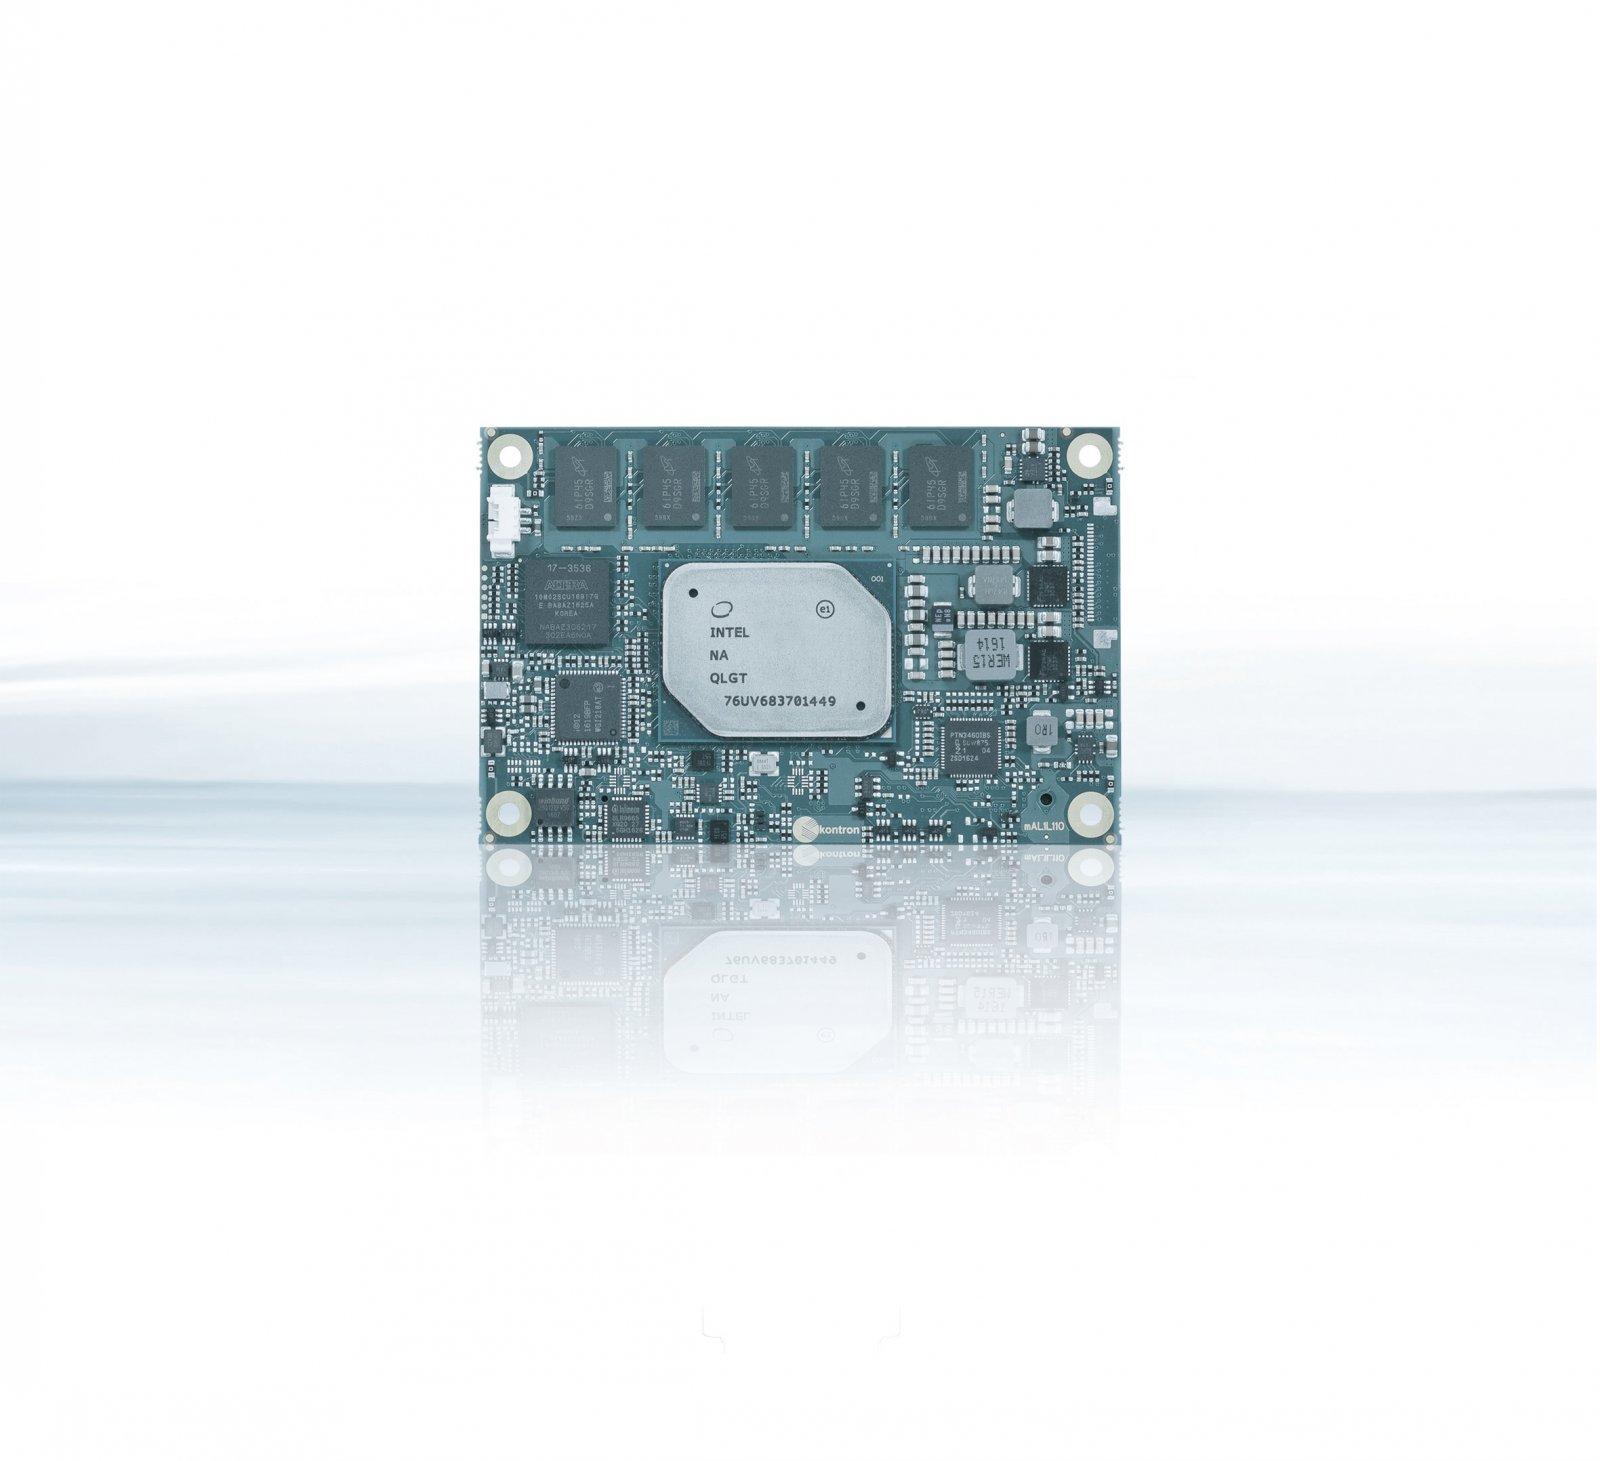 Новое будущее Интернета вещей: модули COM Express Type10 на Intel Apollo Lake